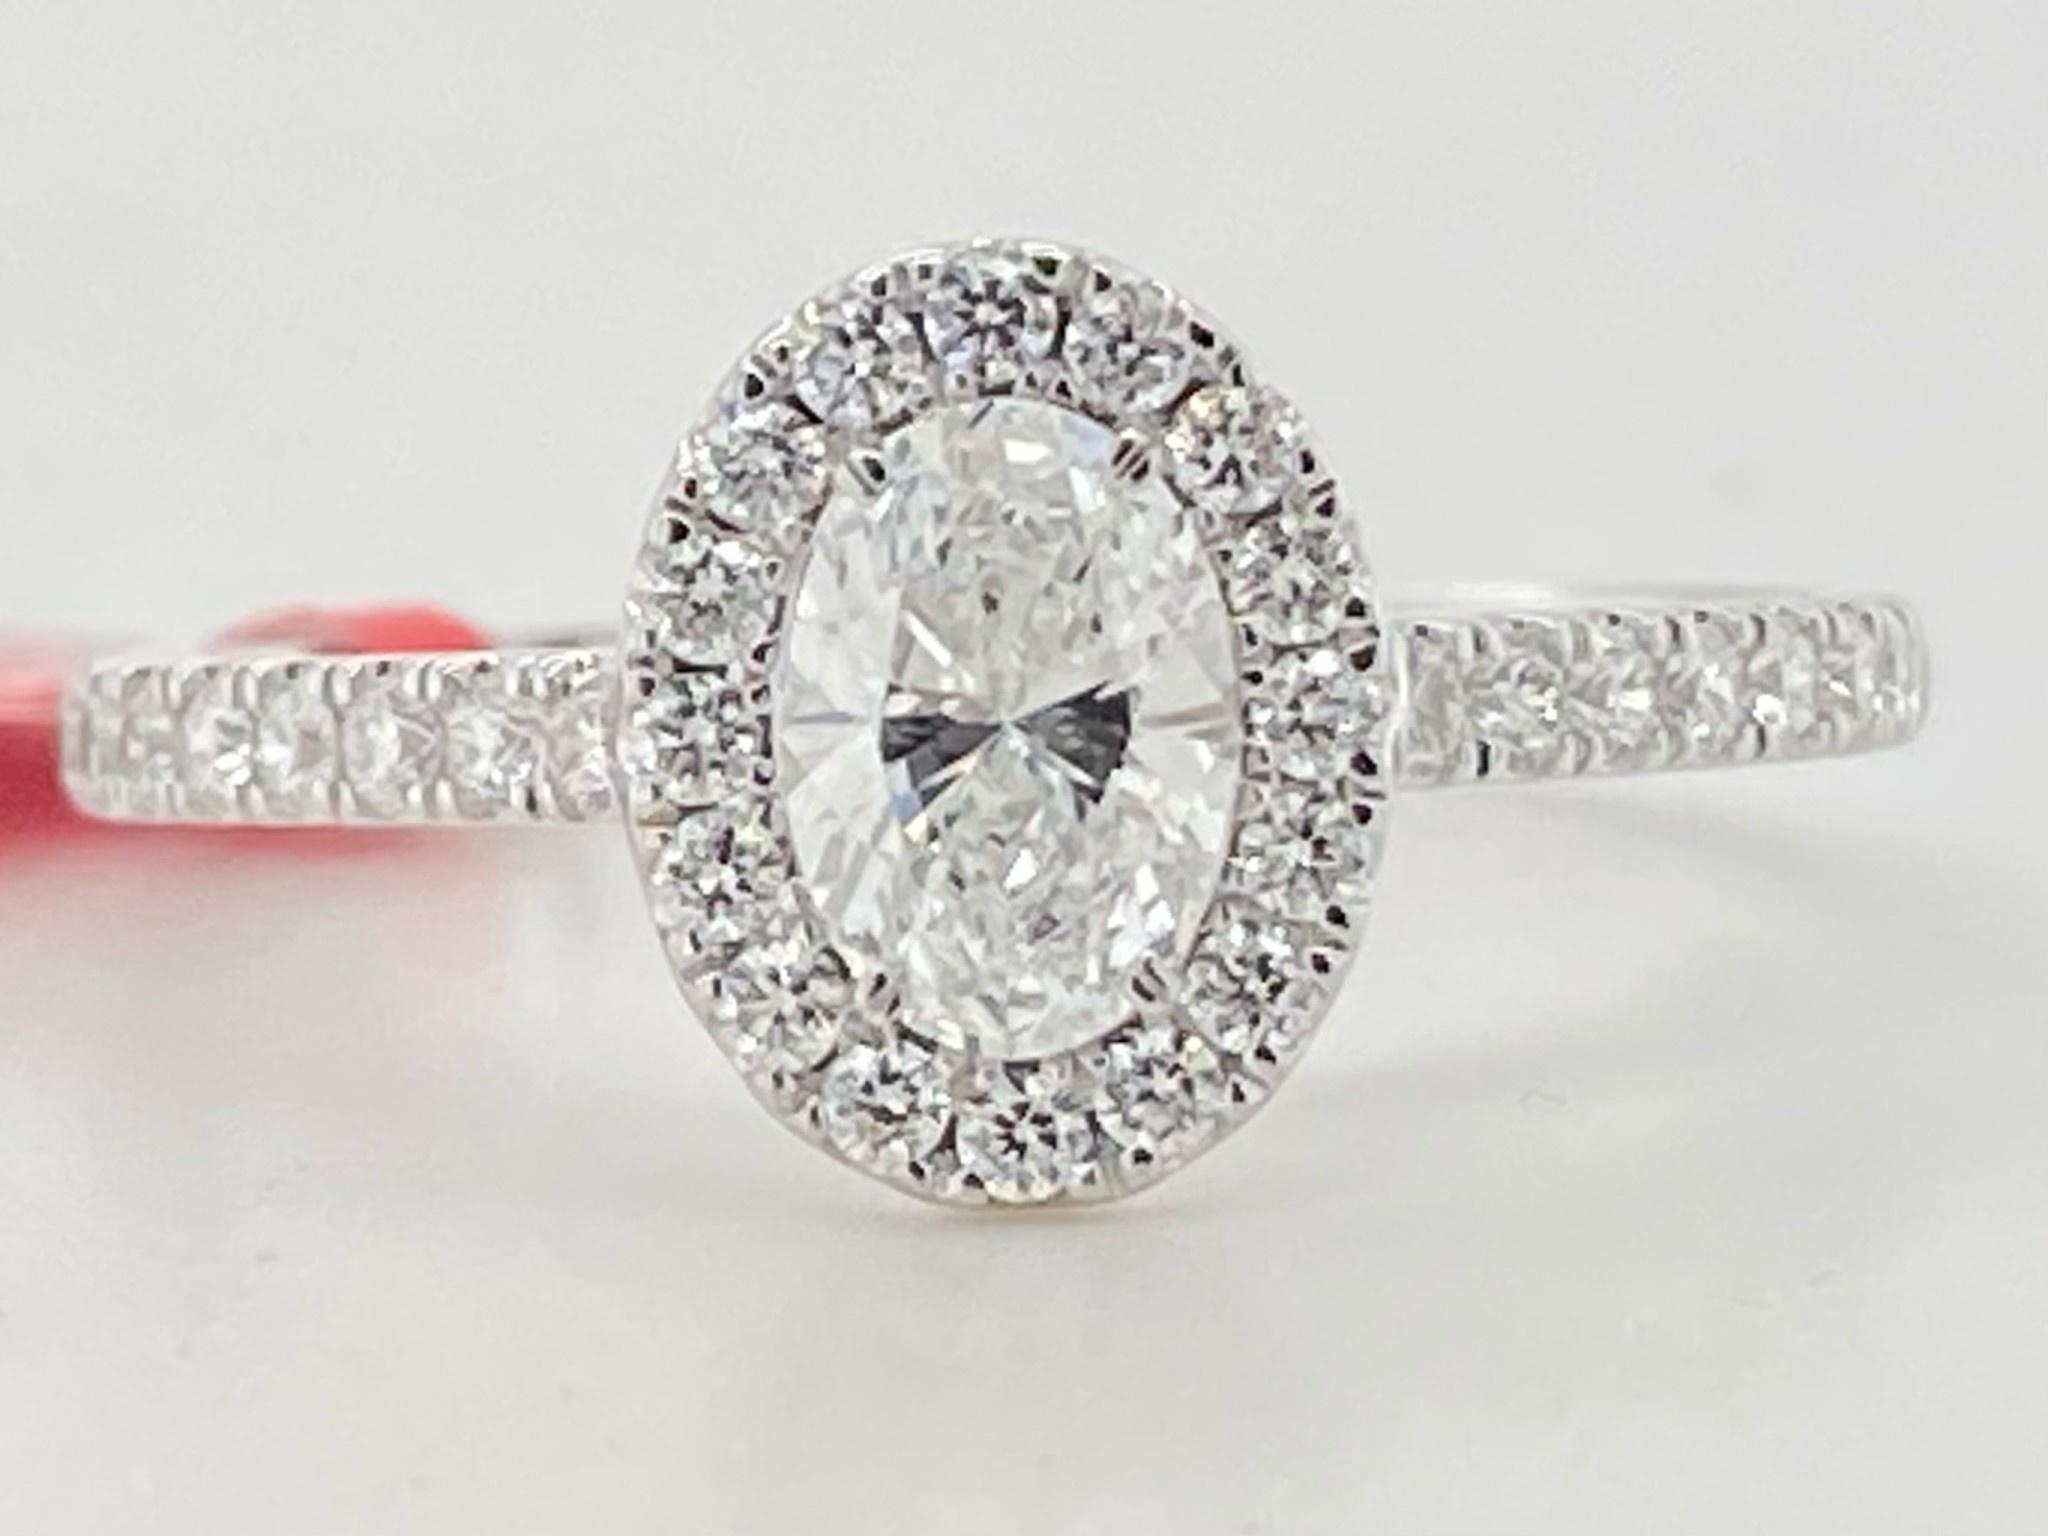 14KW .87TW LG Diamond Engagement Ring